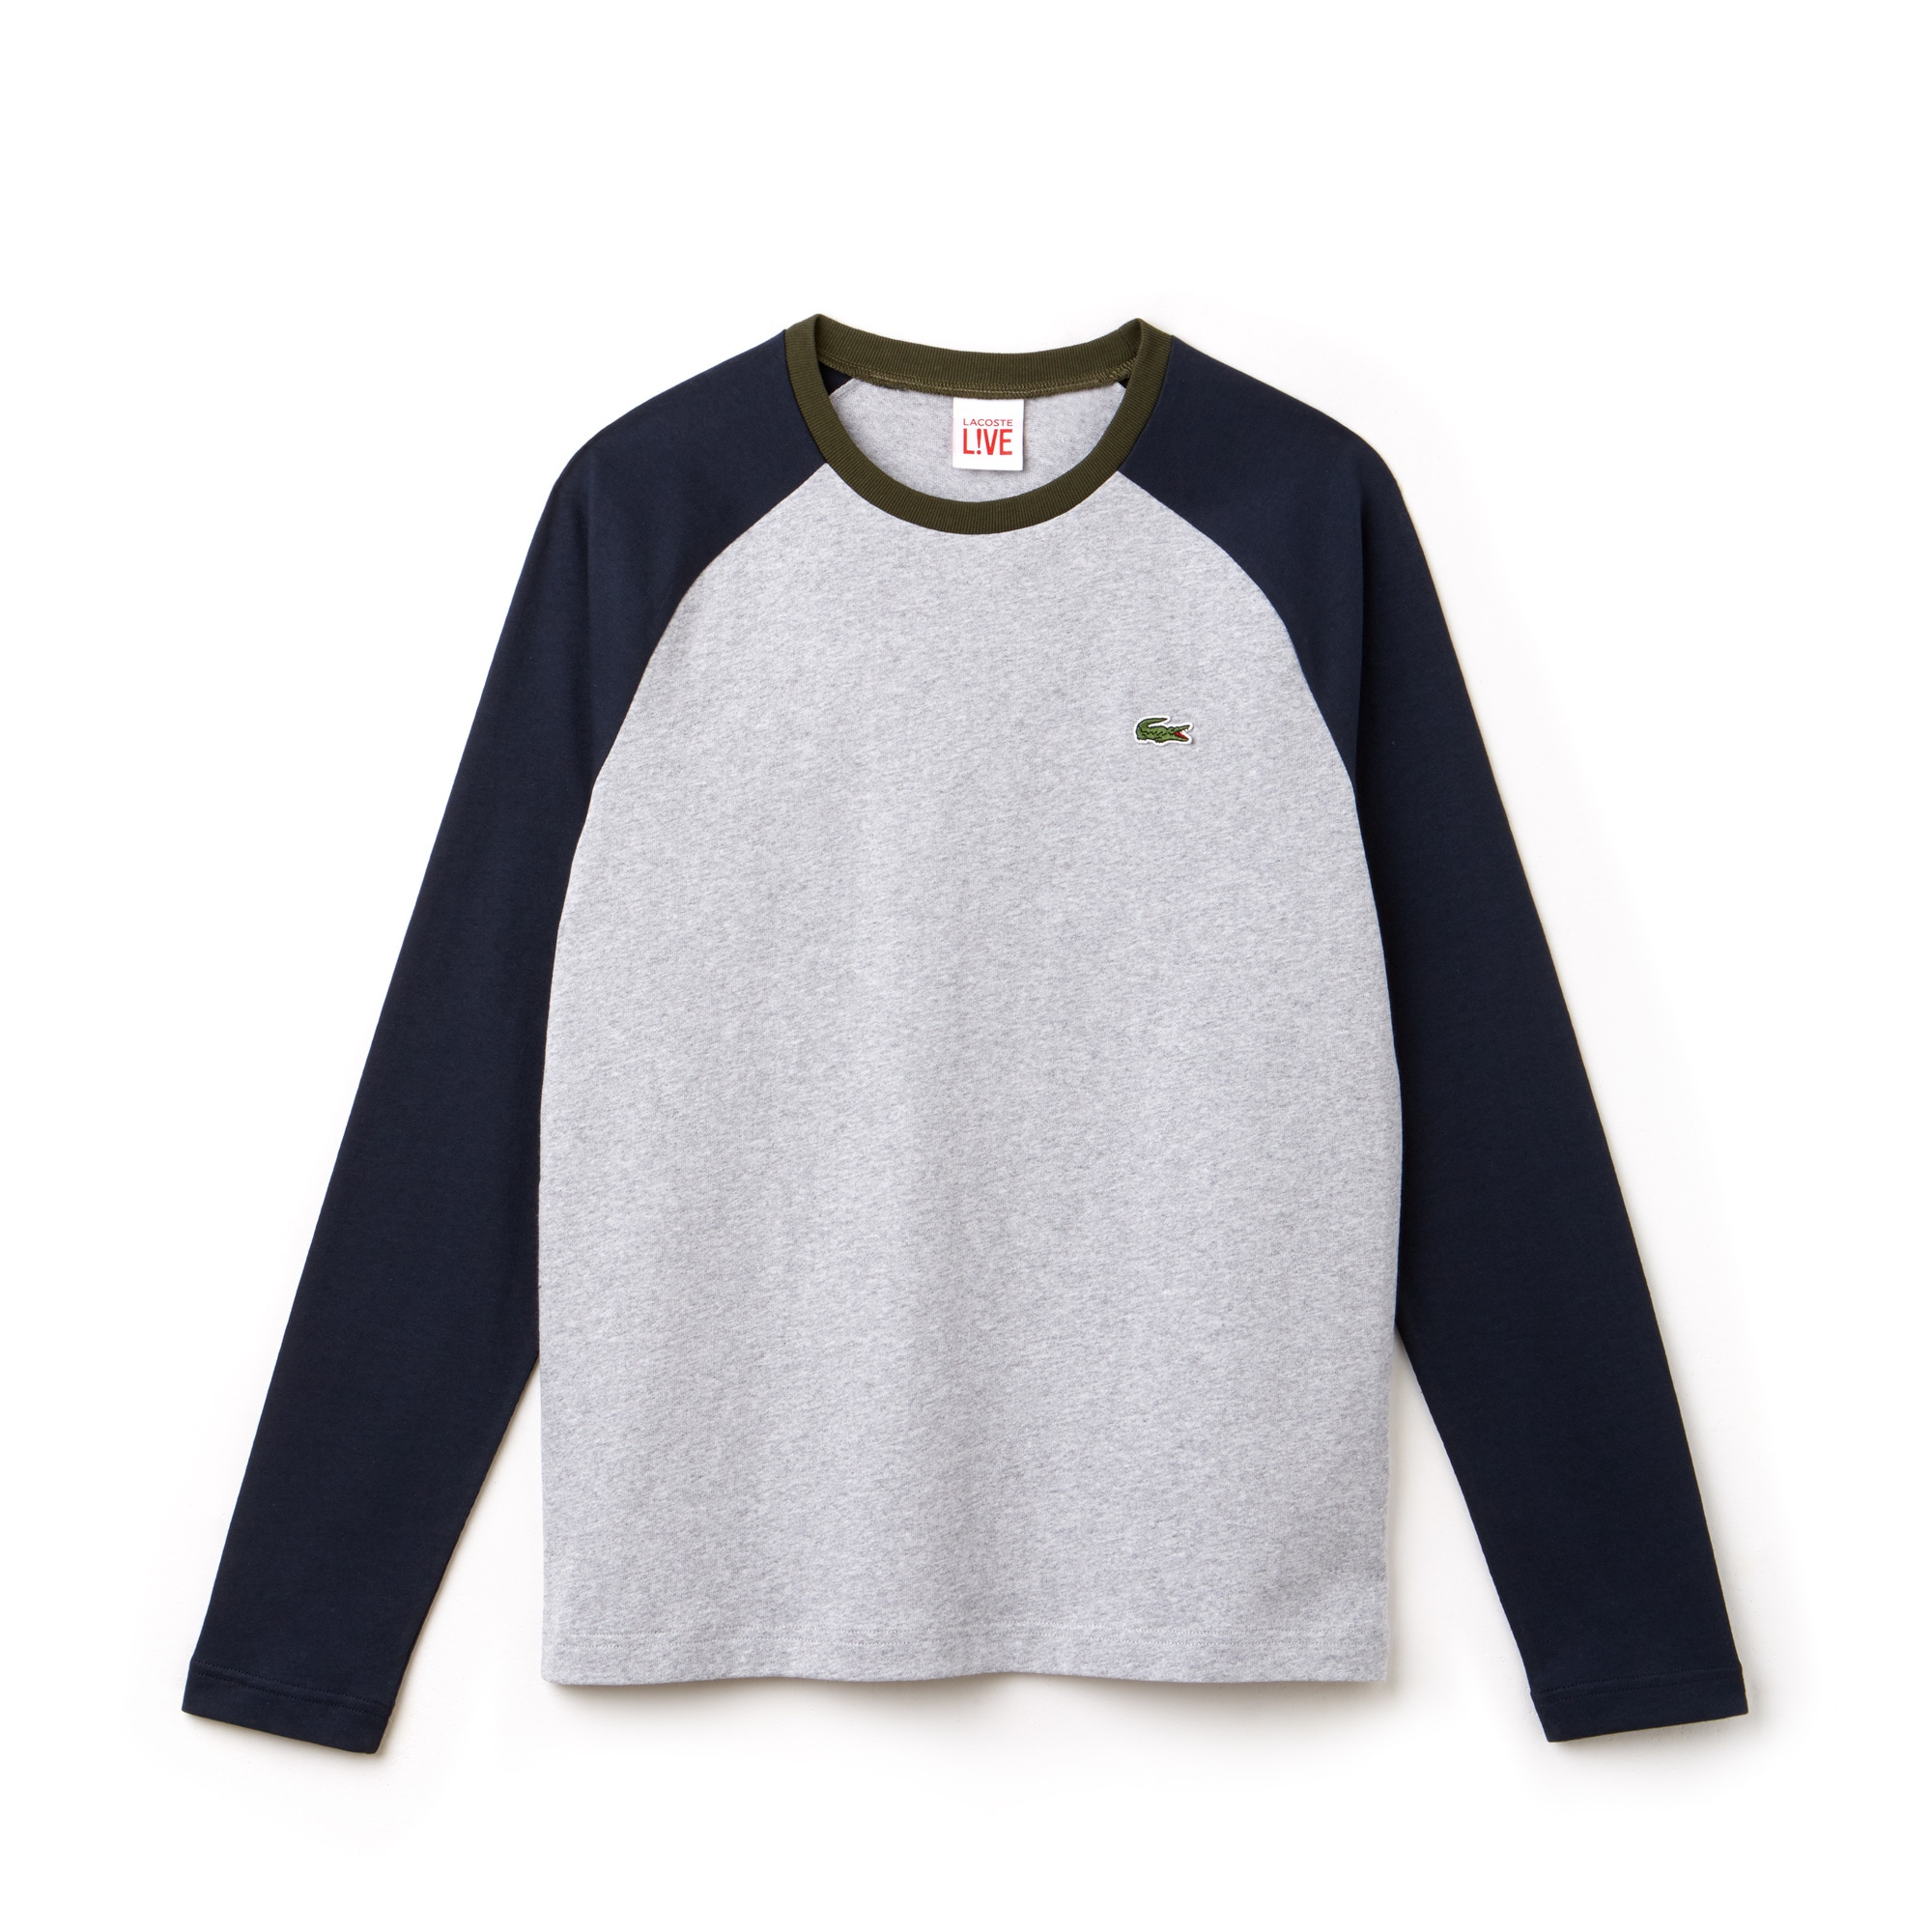 T-shirt de manga comprida Lacoste LIVE em jersey bicolor